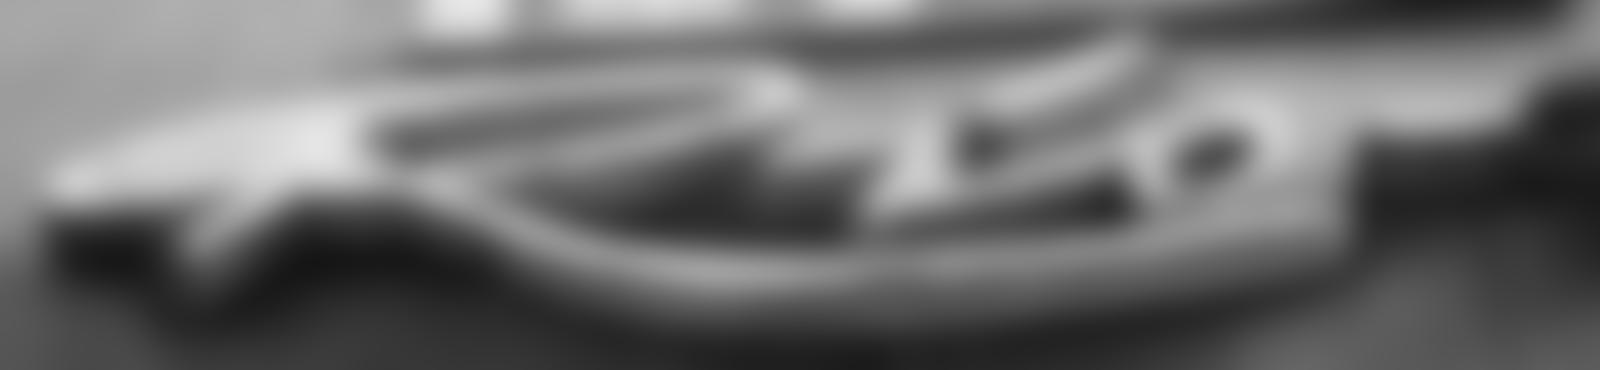 Blurred 96465aa0 bd45 412e 94f9 9c90c4b7916e